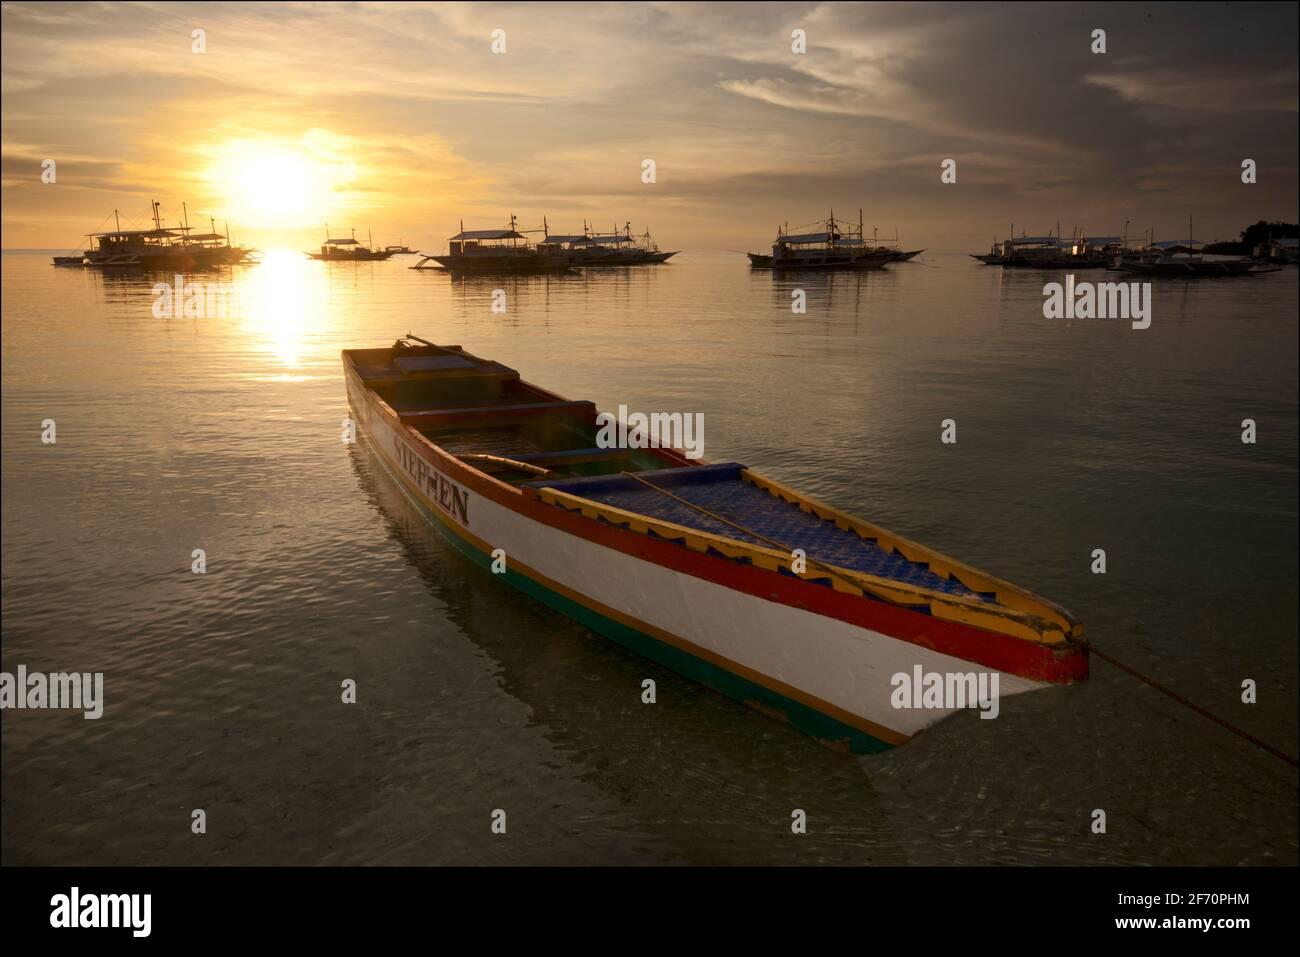 Boat moored off Logon, Malapascua Island at sunset. Visayan Sea, Cebu, Philippines. Stock Photo